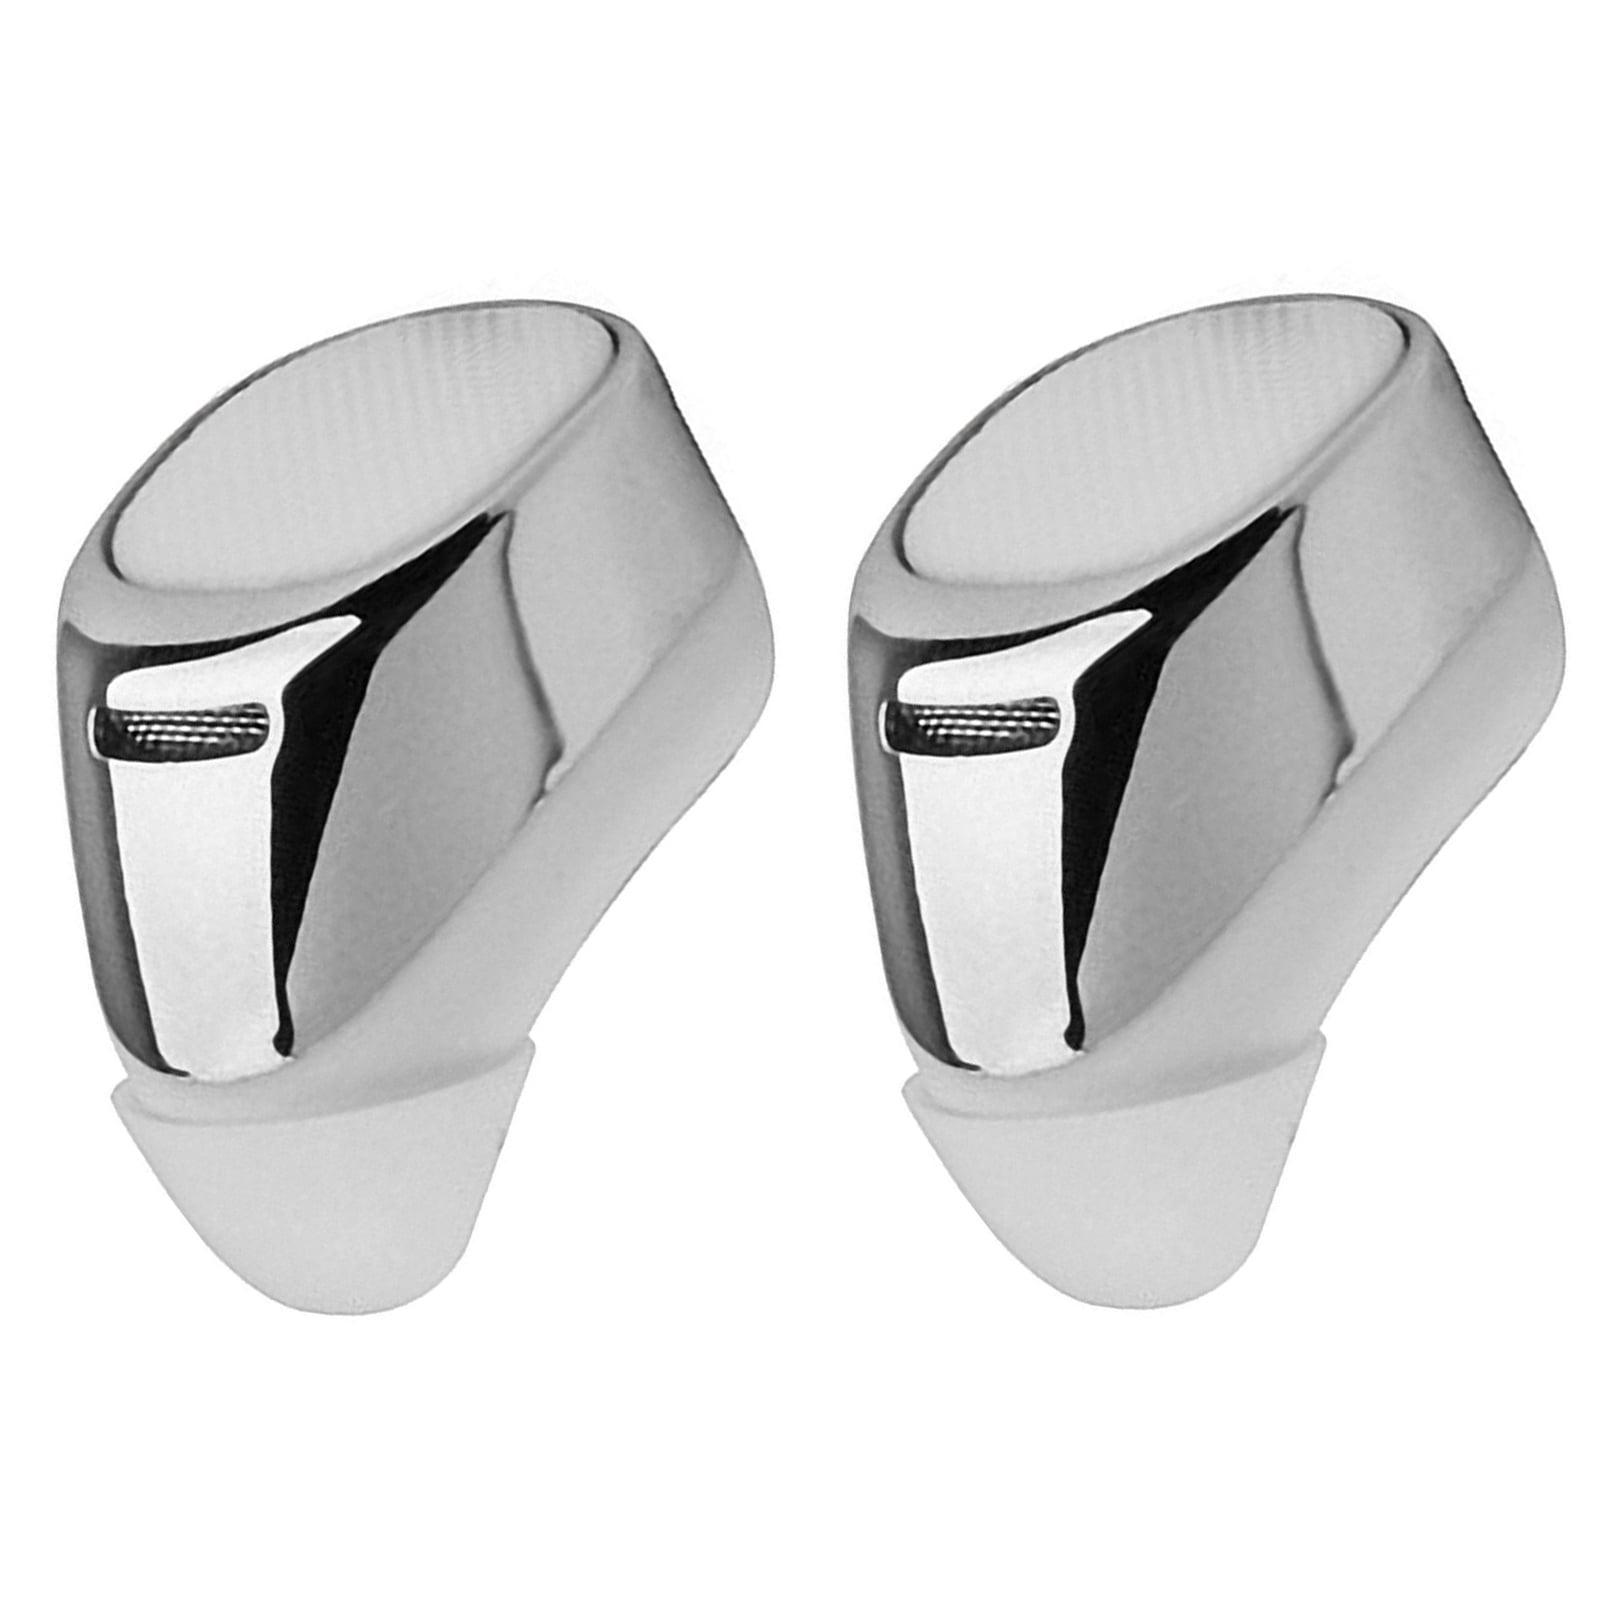 2 Pack Mini Bluetooth 4.1 Wireless In-ear Earbuds Stereo Headset Headphones Earphones